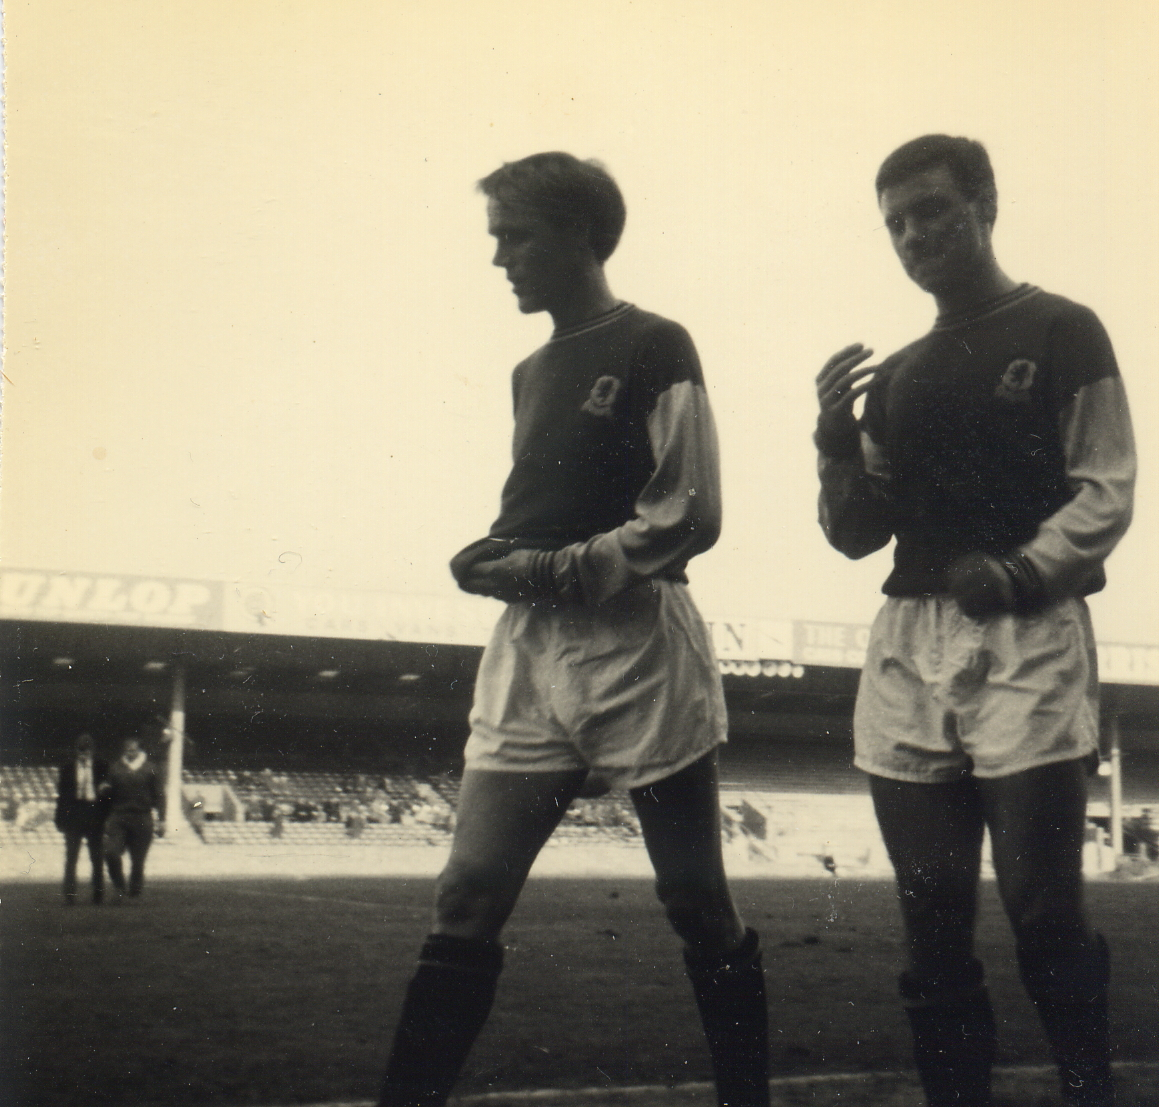 Gordon Lee Keith Bradley Reserves match